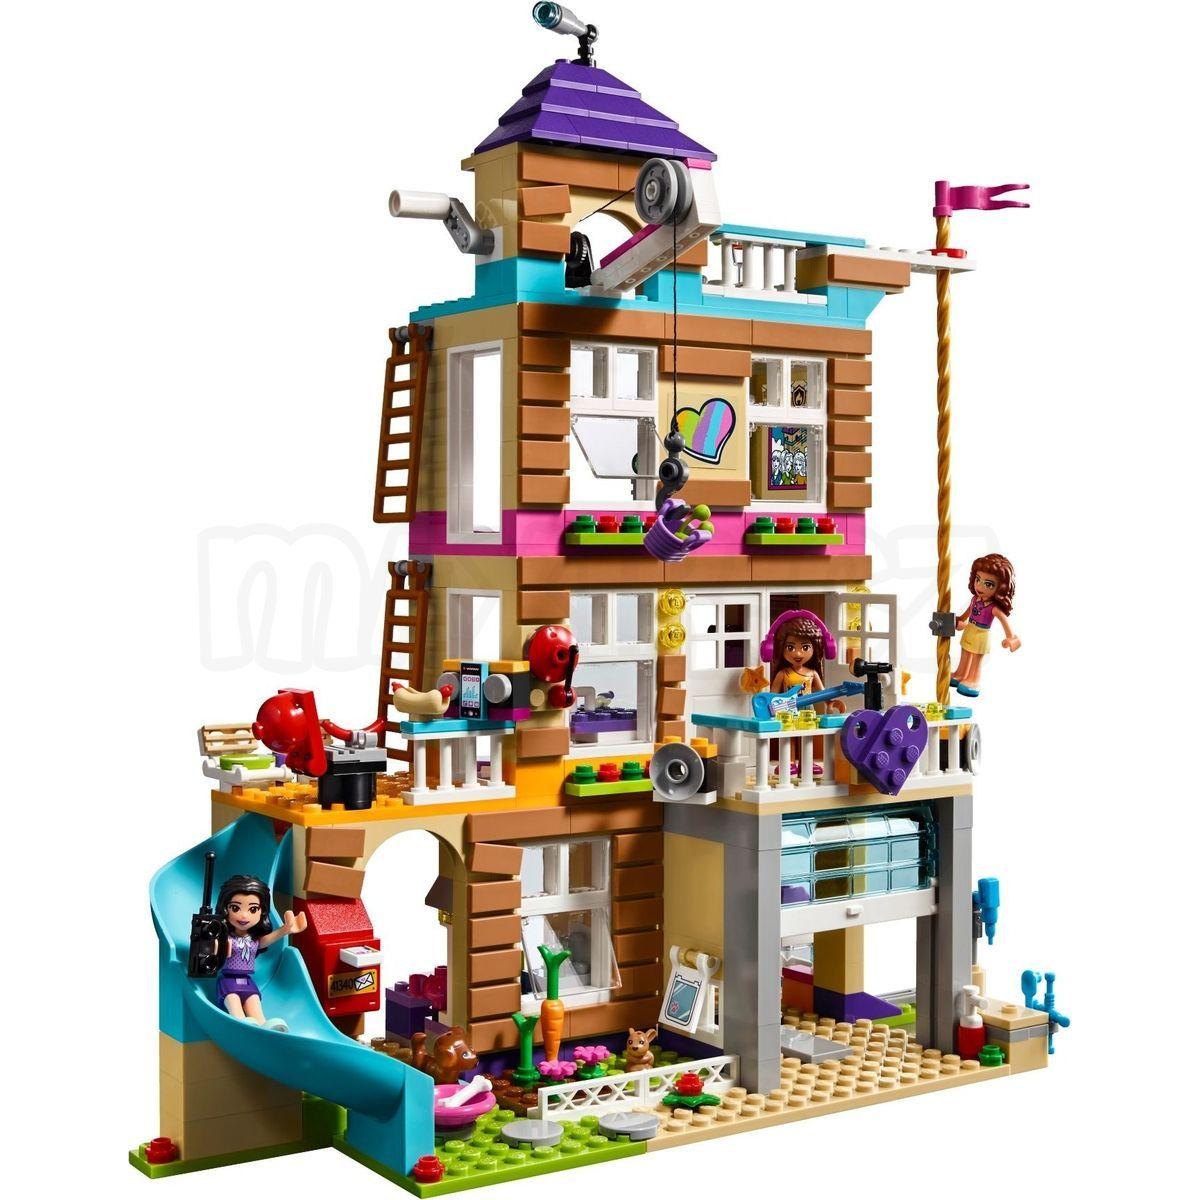 lego friends 41340 d m p telstv max kovy hra ky. Black Bedroom Furniture Sets. Home Design Ideas